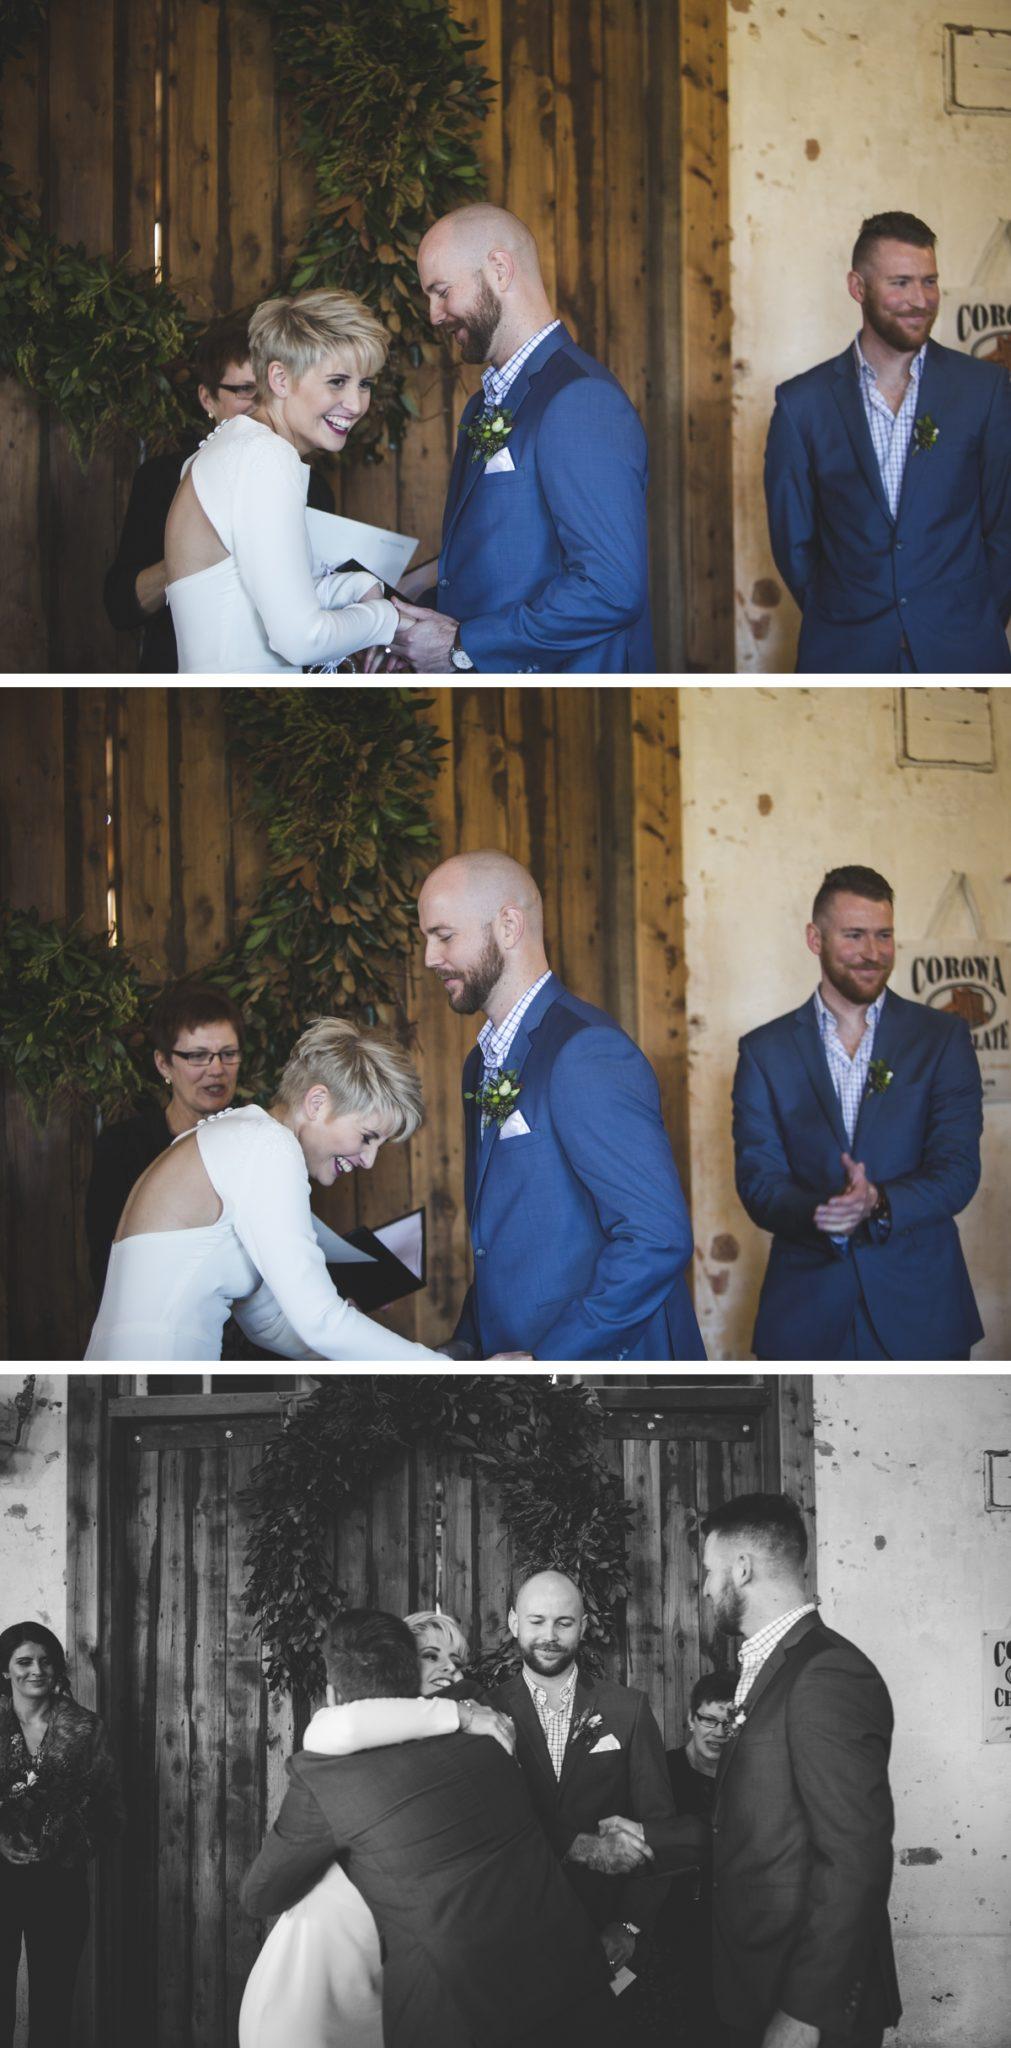 corowa whisky factory wedding venue wedding photographer211